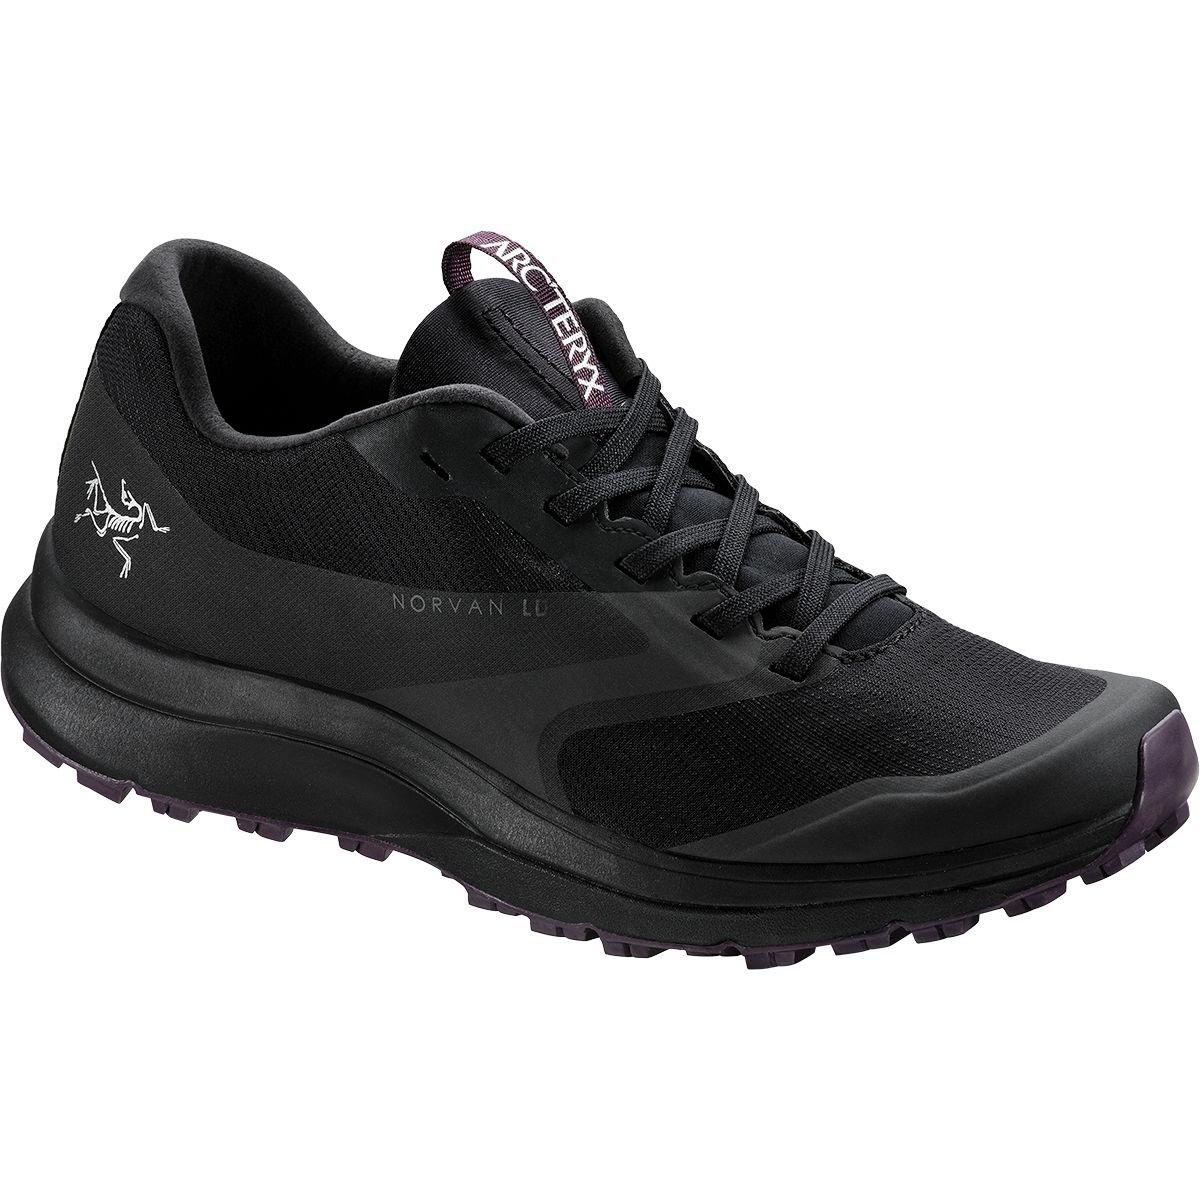 Arc'teryx Womens Norvan LD GTX B07211G85H US 9.0/UK 7.5|Black/Purple Reign